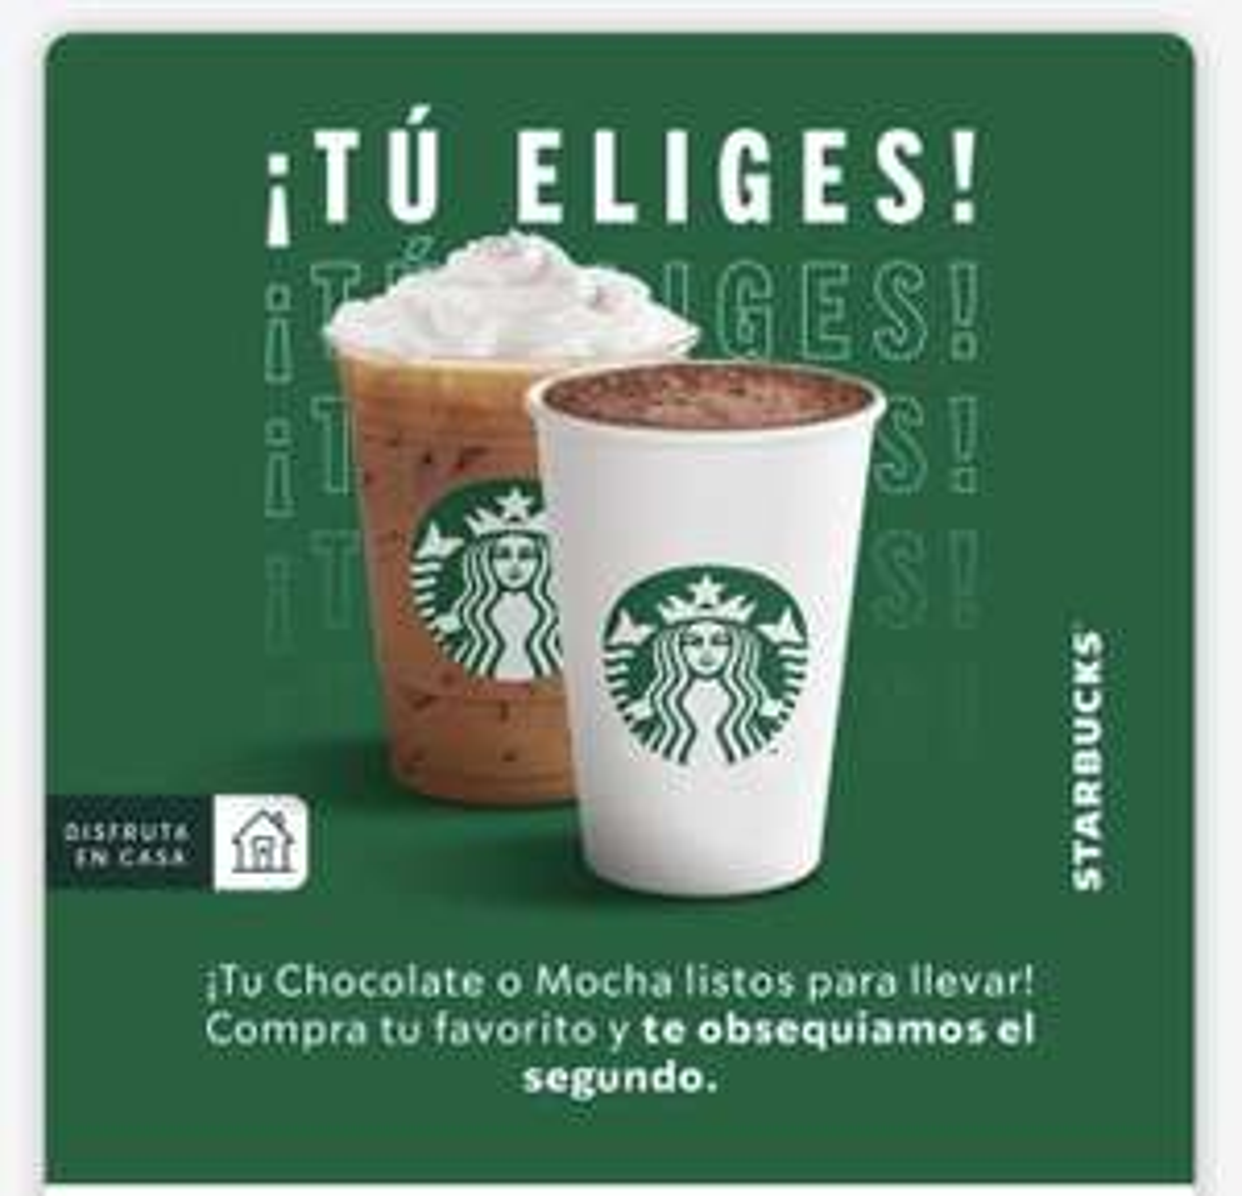 Starbucks: 2x1 Mocha o Chocolate